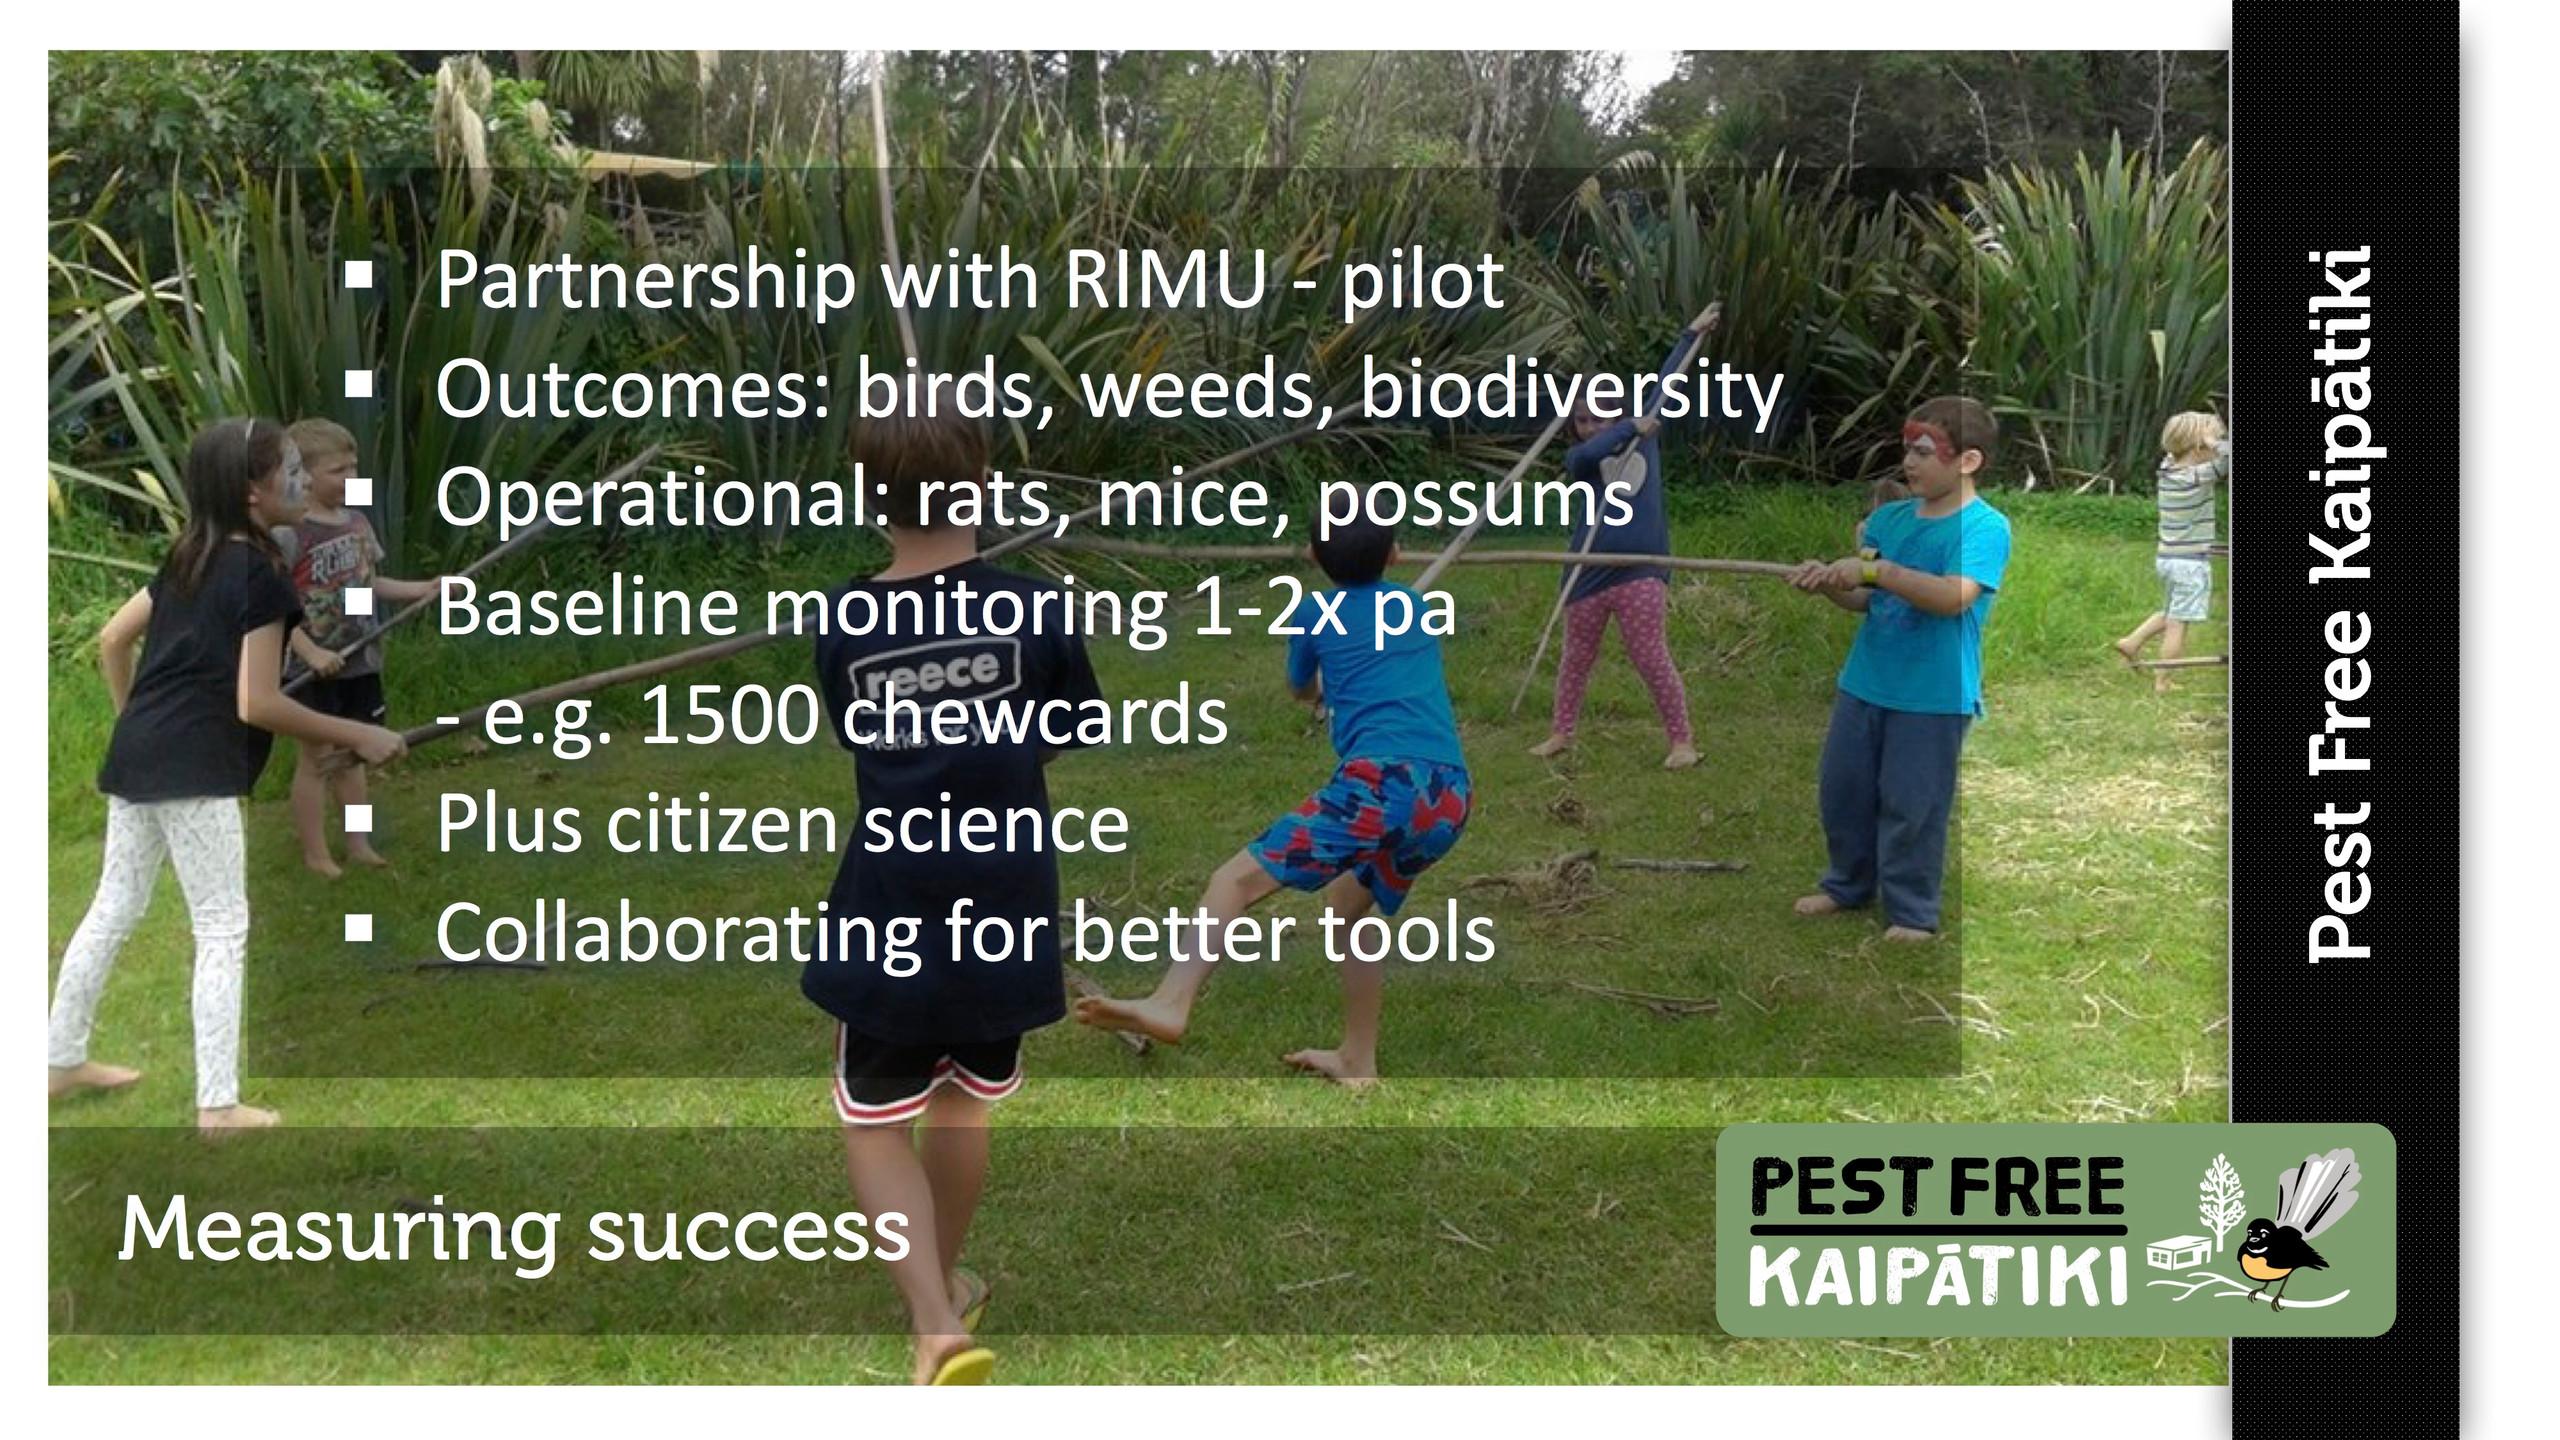 Pest Free Kaipatiki-Pestival-slide11